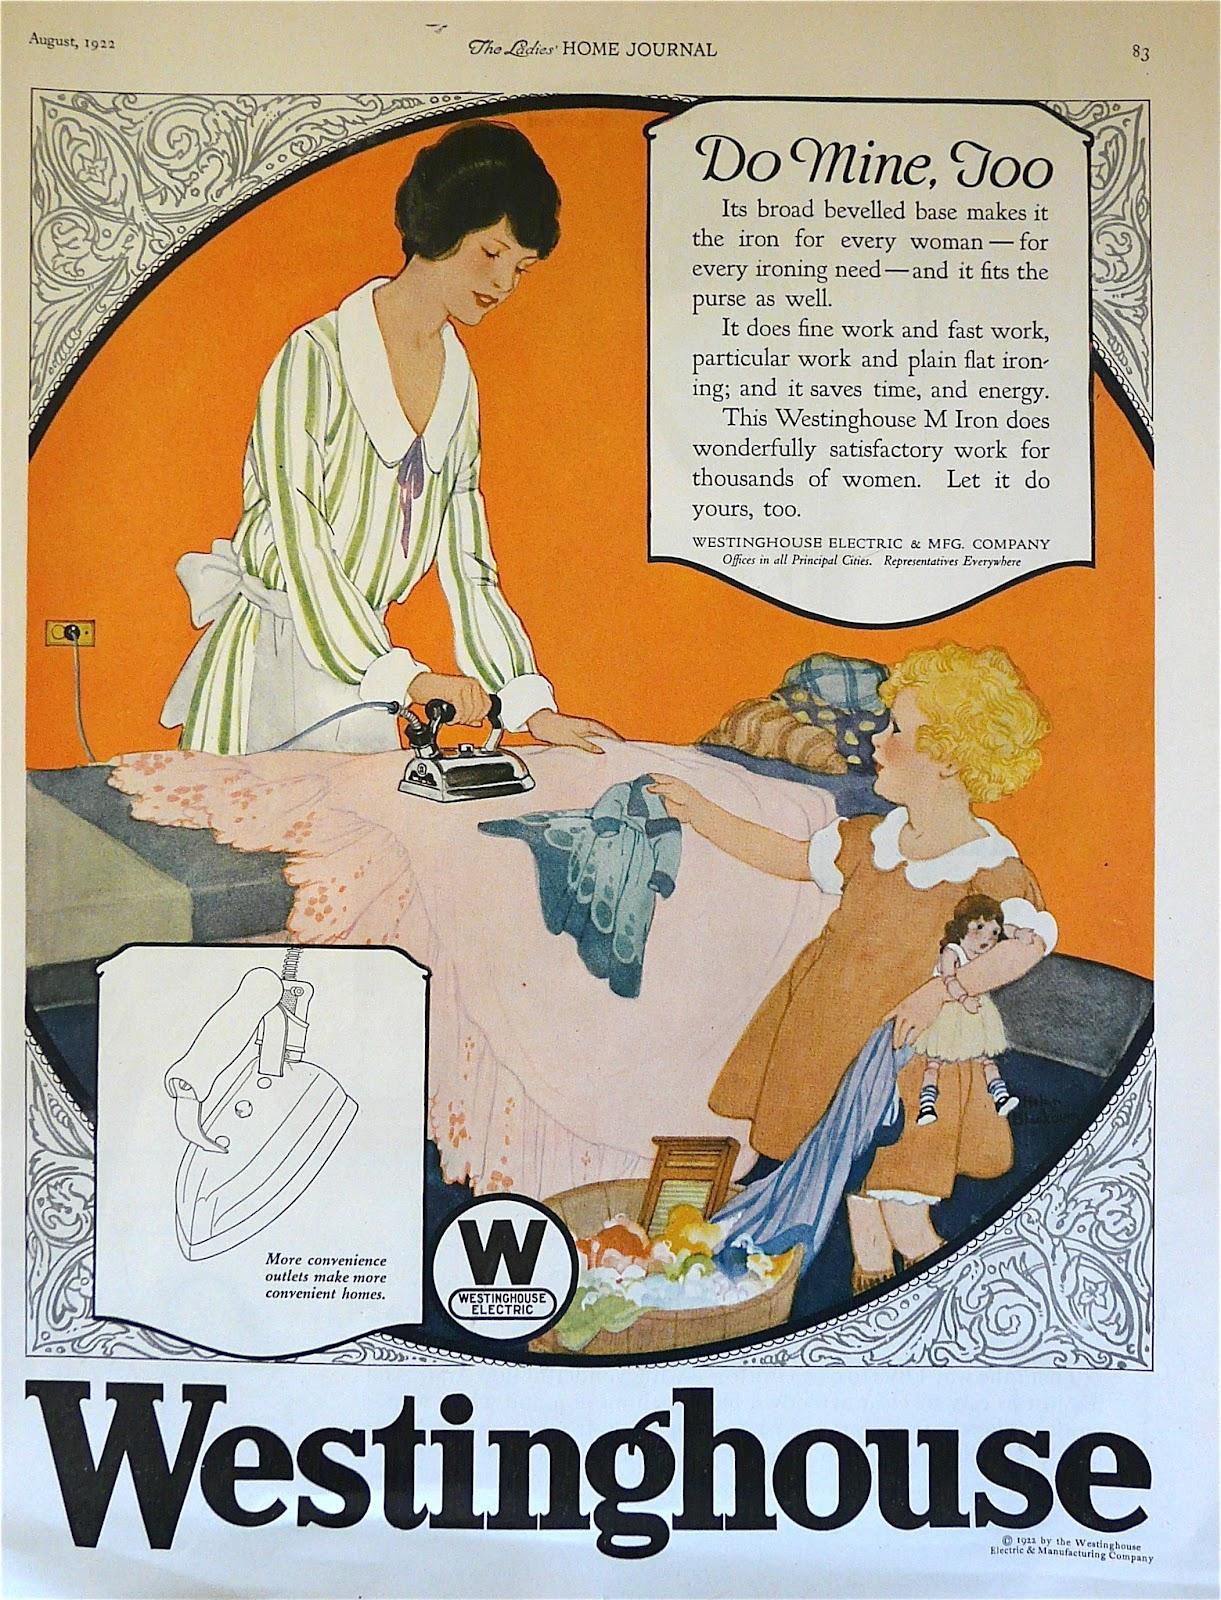 Vintage 1922 Westinghouse Ladies Home Journal magazine ad